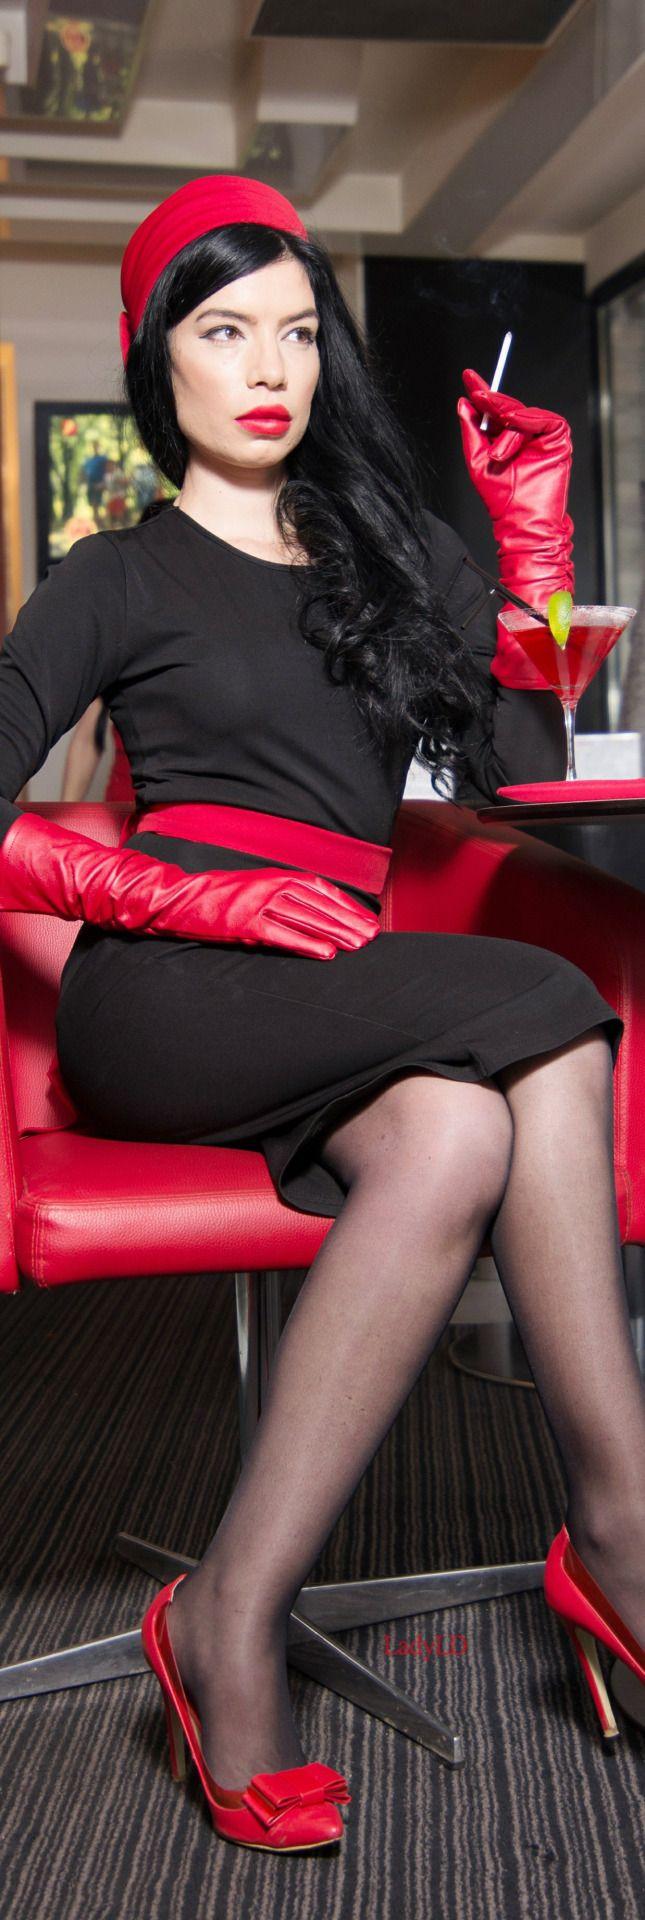 451 best rojo images on pinterest red color red and colour red. Black Bedroom Furniture Sets. Home Design Ideas